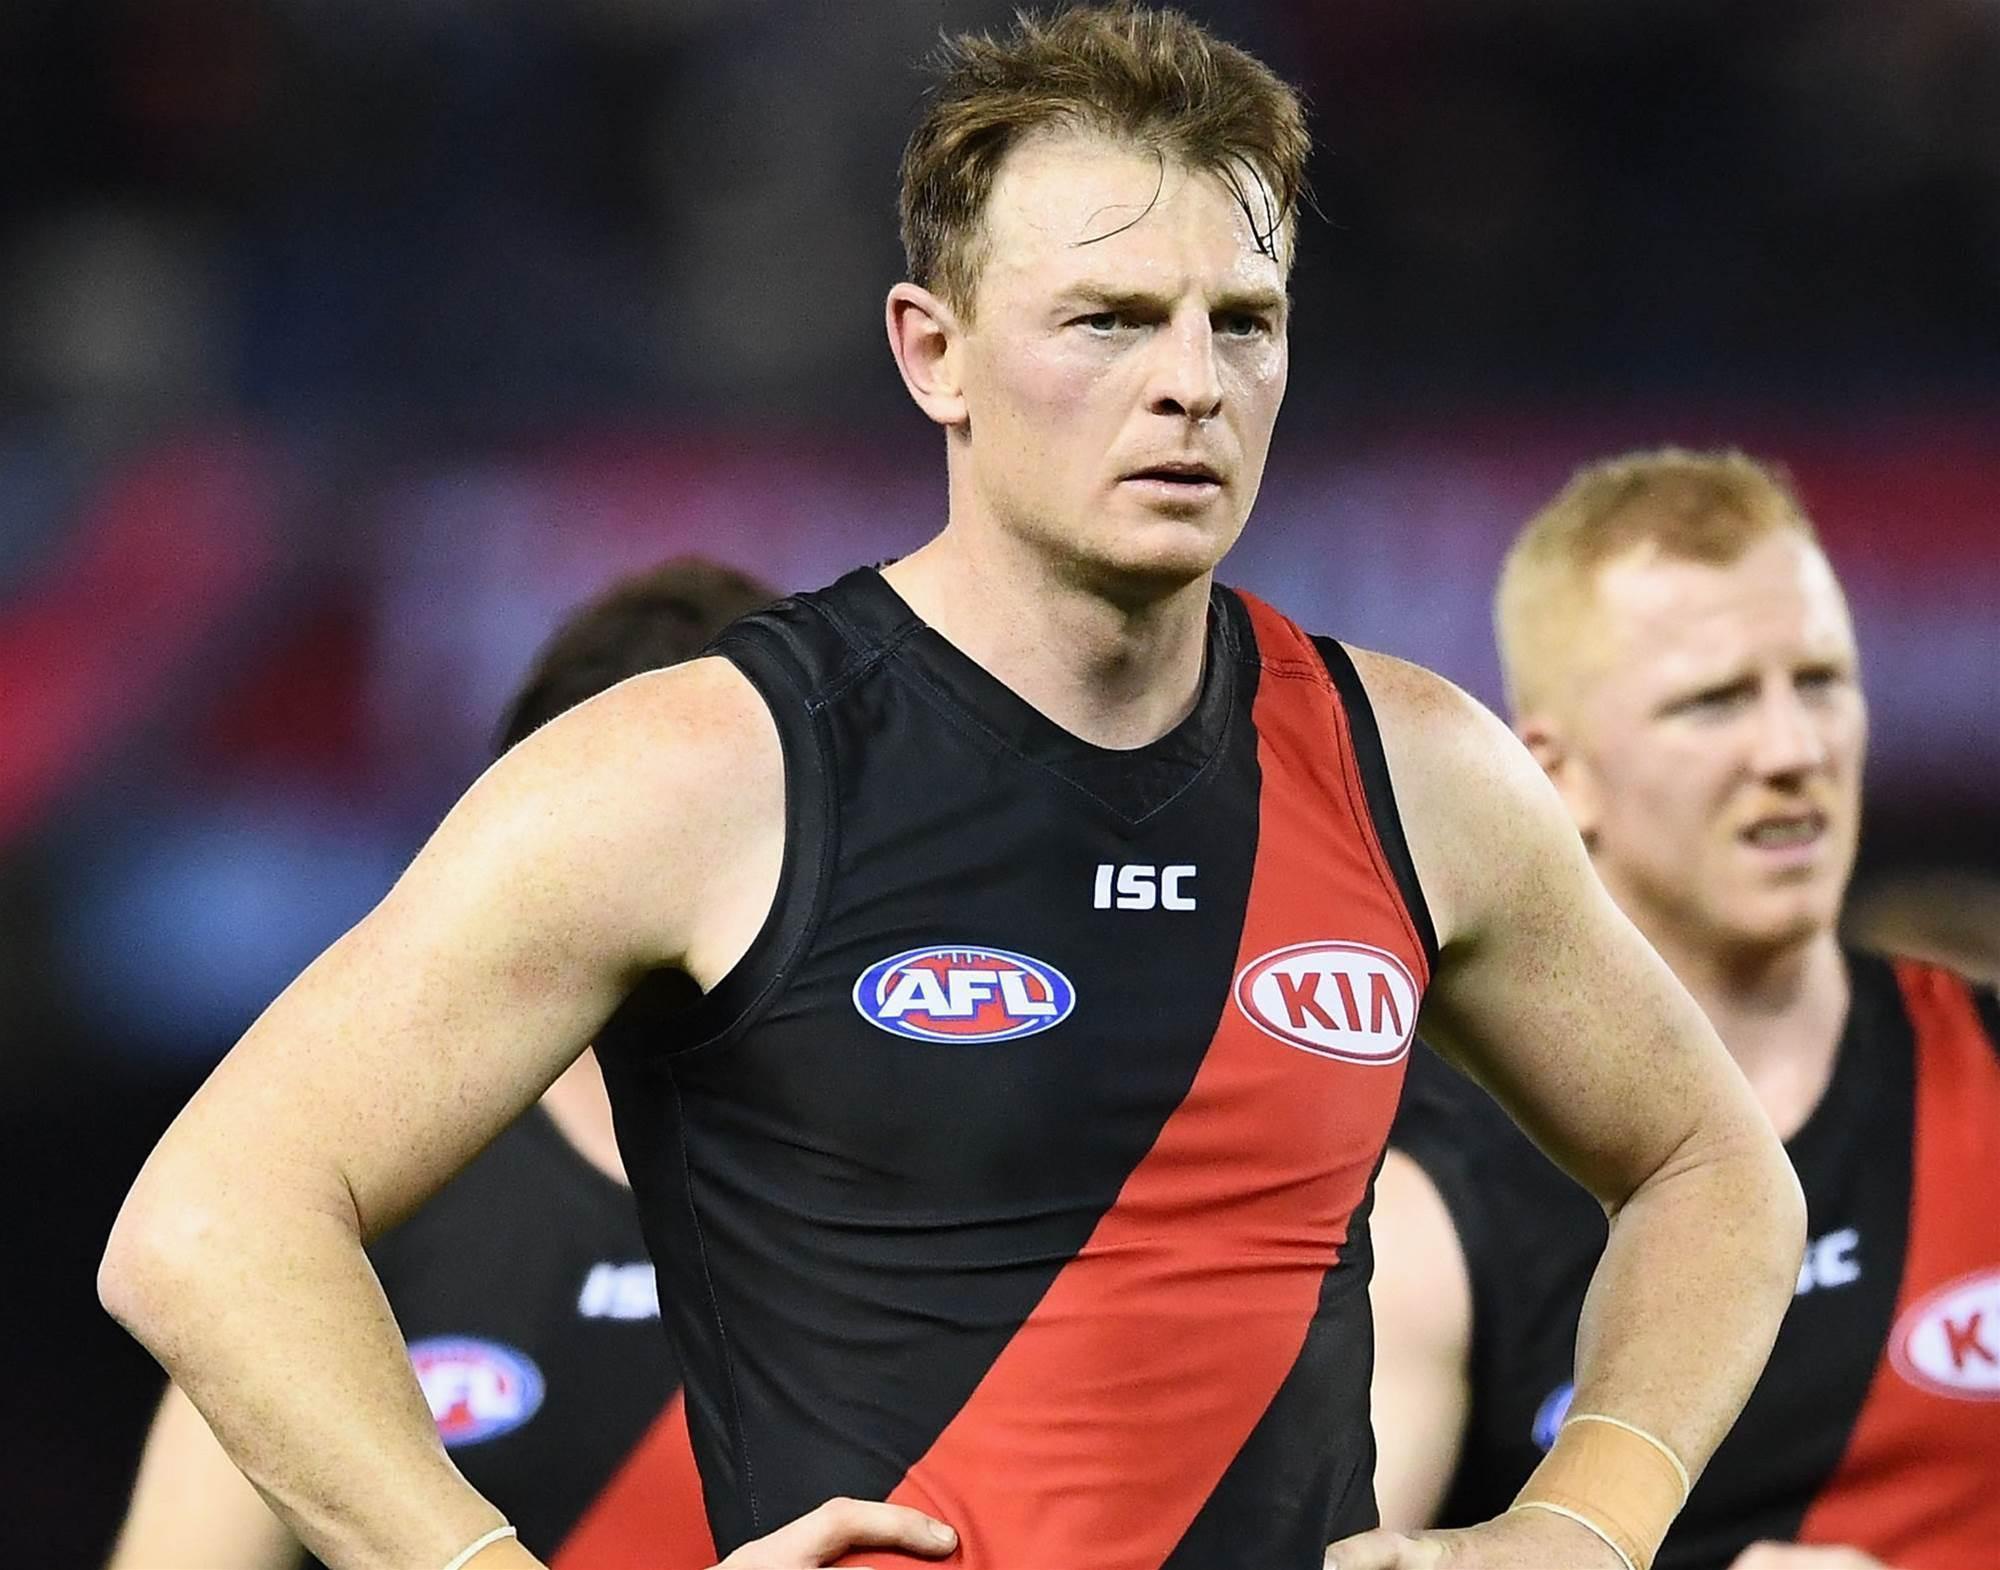 Bomber confident ahead of Swans showdown